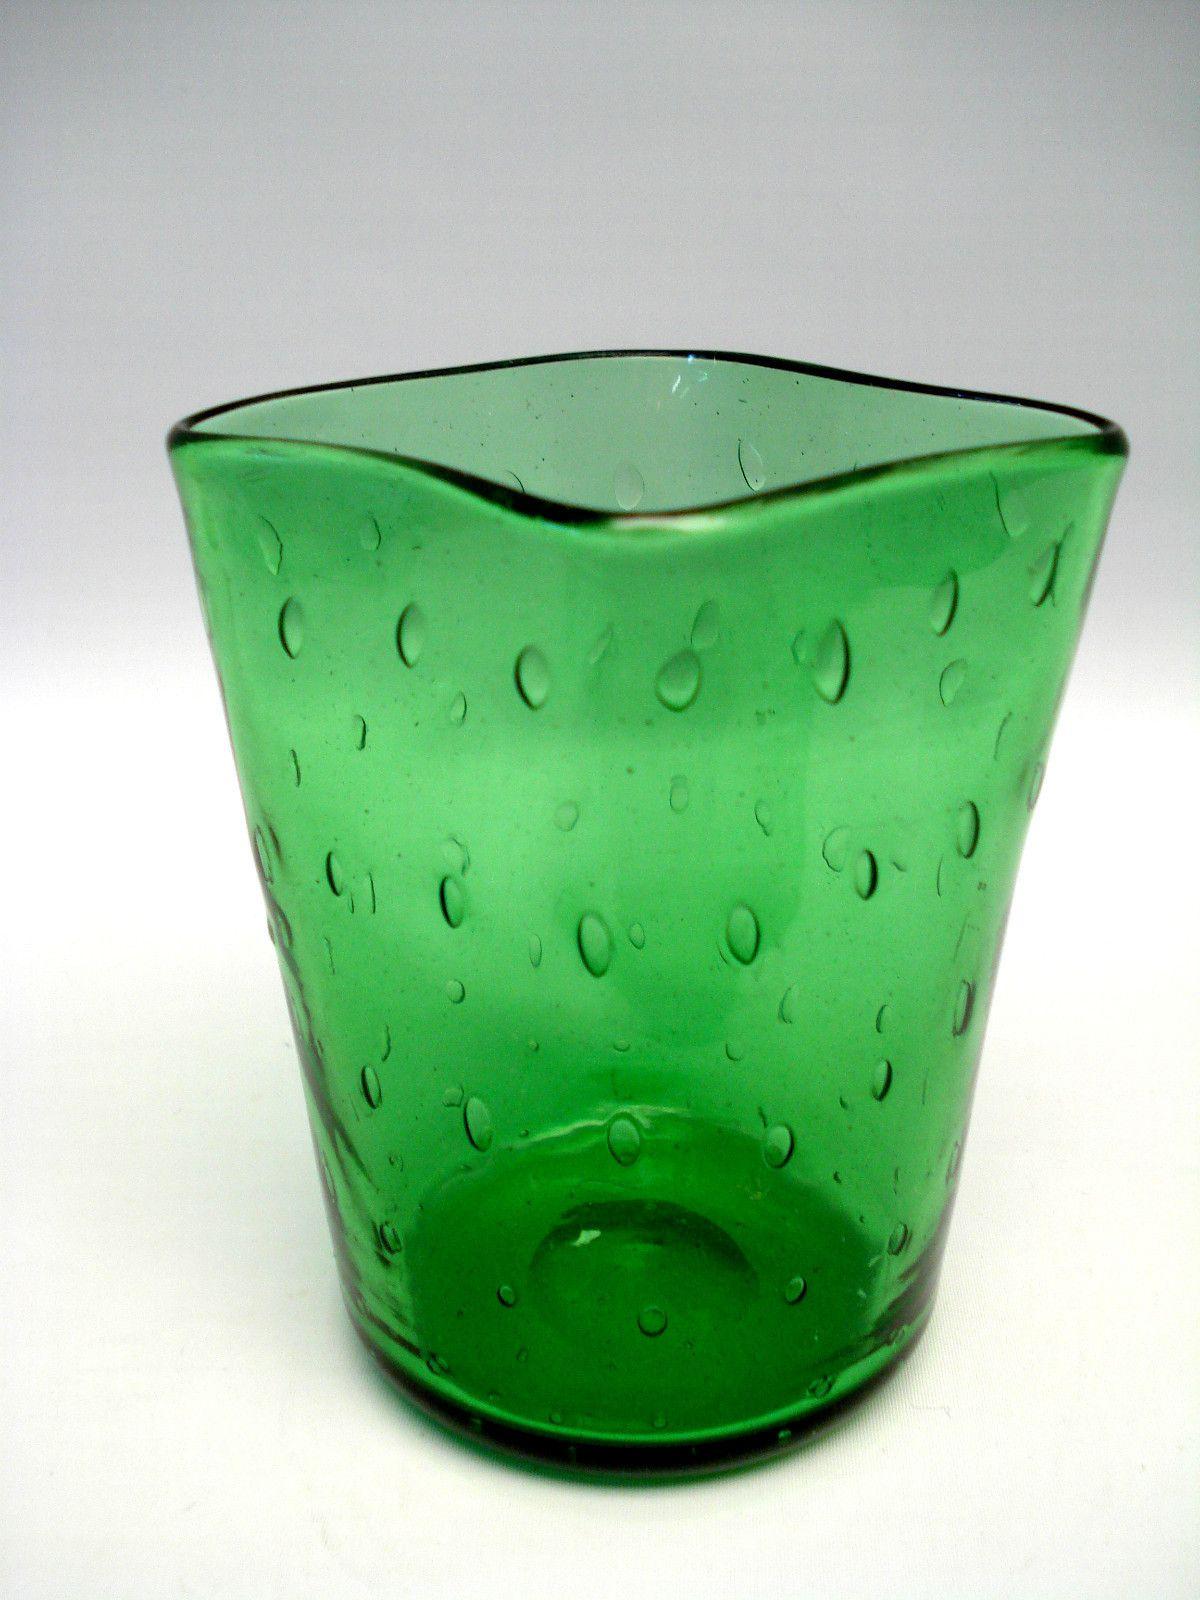 GREEN BULLICANTE TUMBLER GLASS CIGARETTE HOLDER. 4 x 3.5in